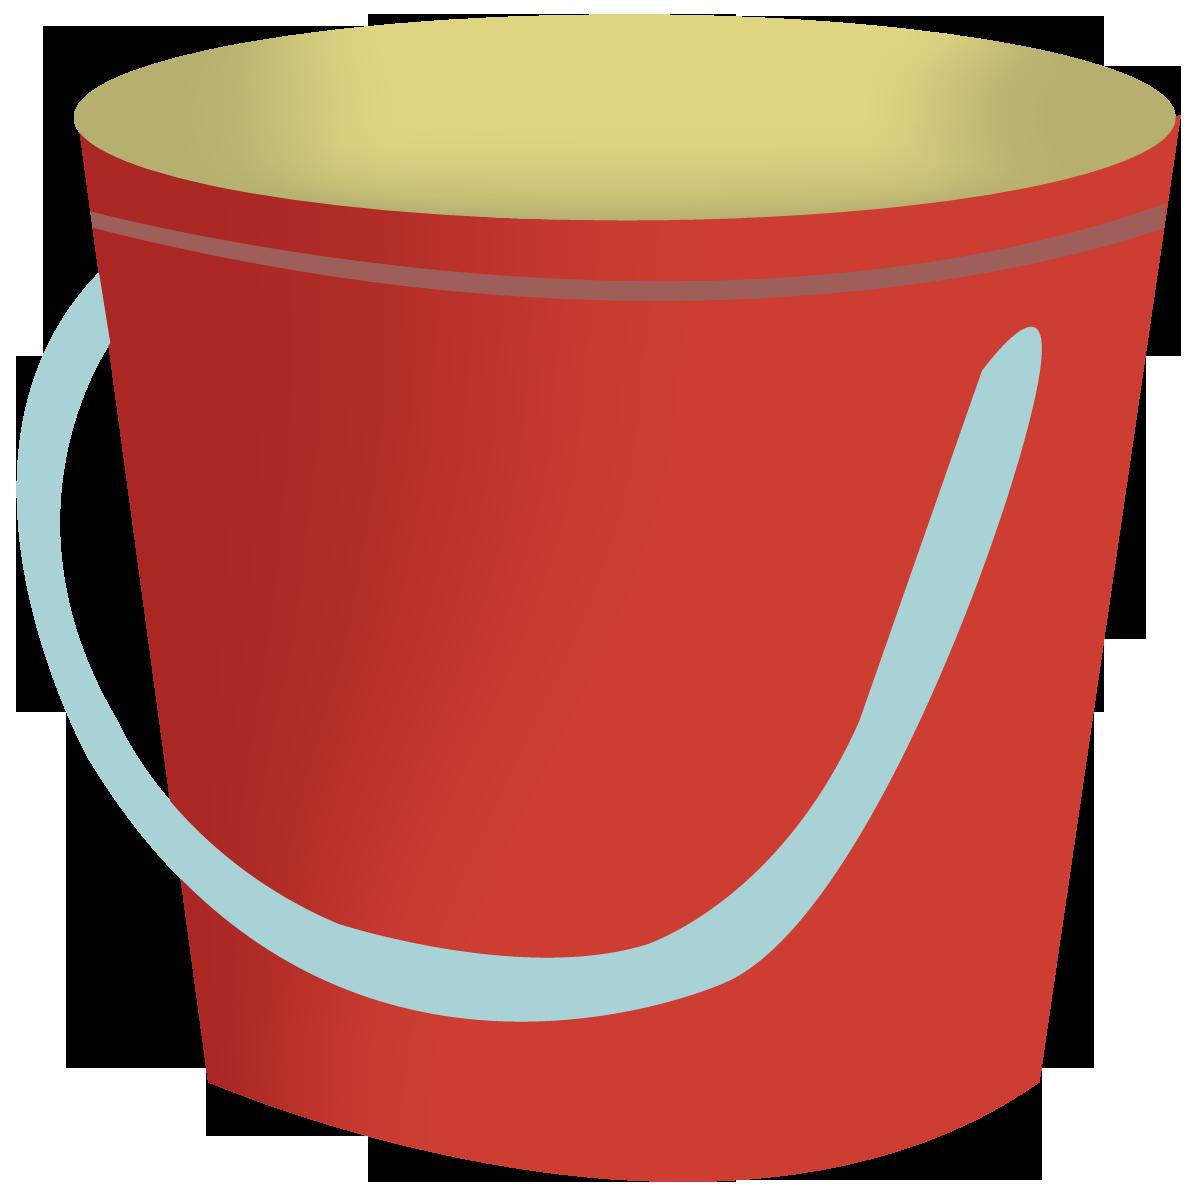 Bucket clip art jpg. Raffle clipart transparent background